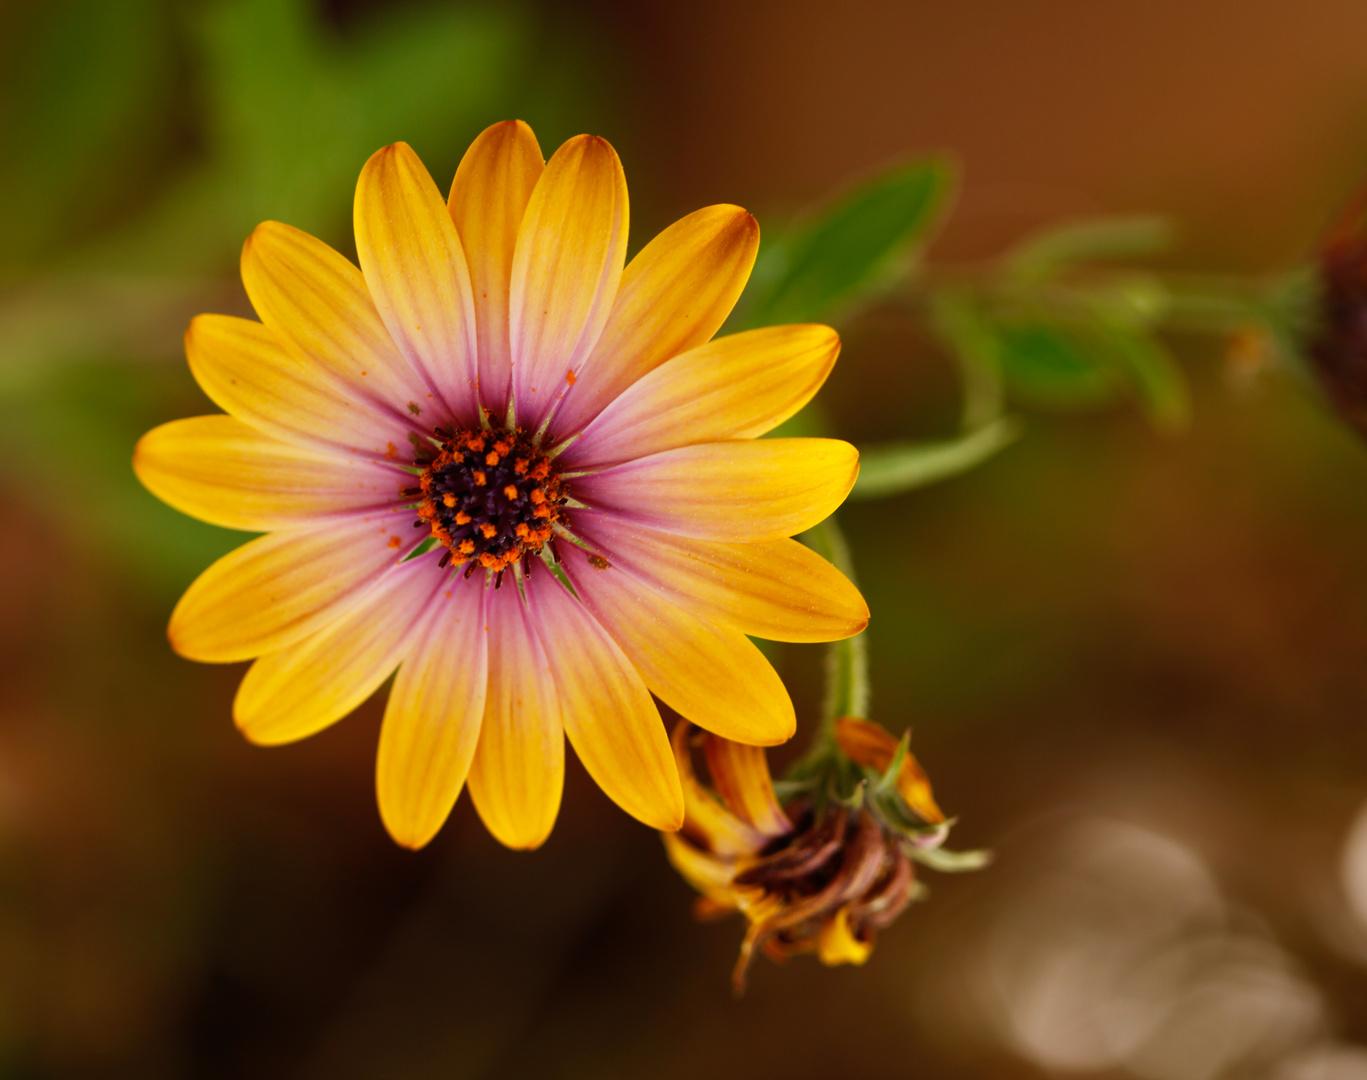 Bonita flor !! Para Merce